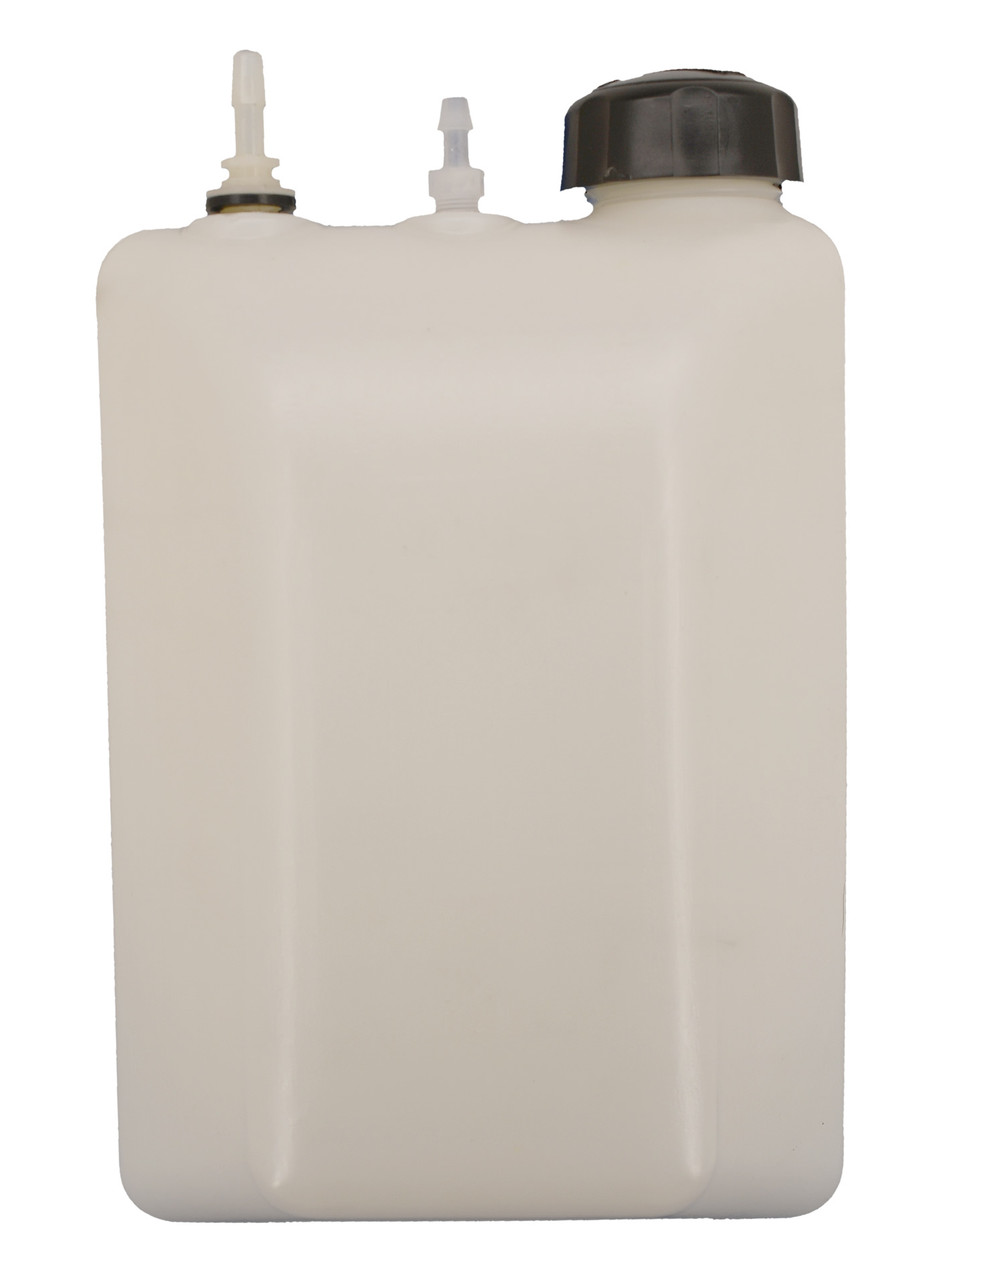 3qt Plastic Fuel Tank, Single Mount